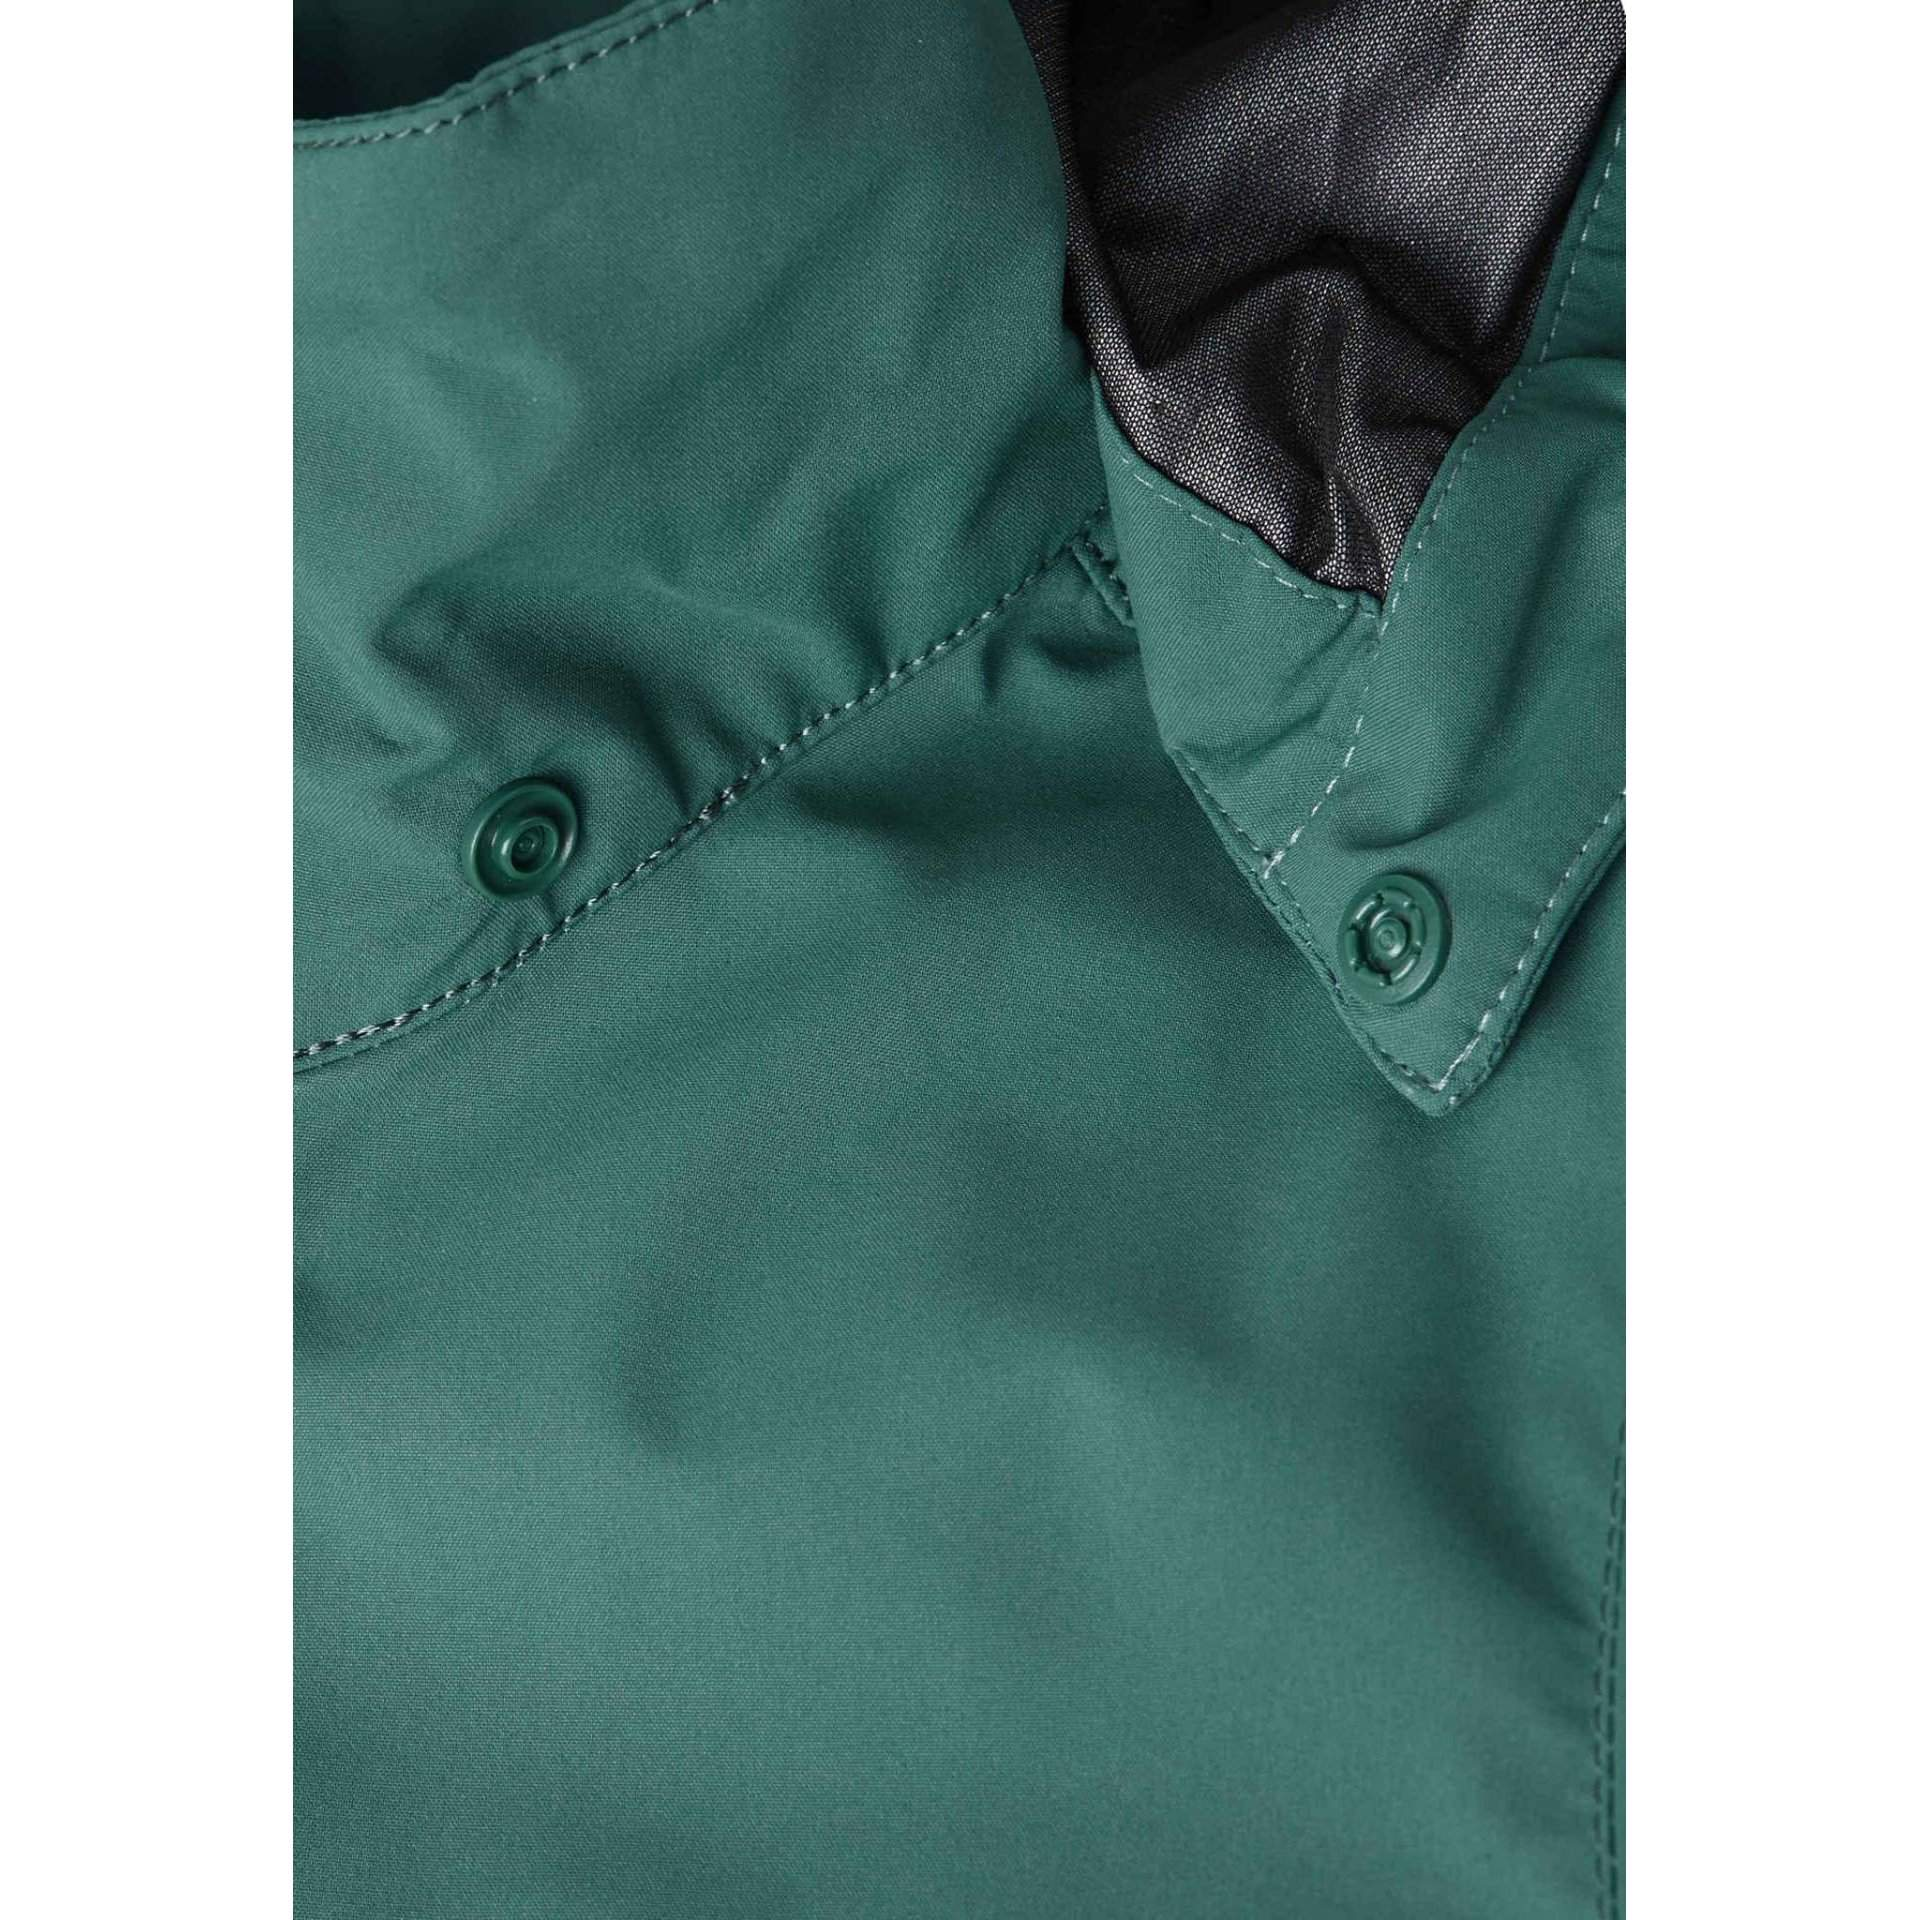 KURTKA REIMA KUOPIO 531509-8980 PINE GREEN ZAPIĘCIE